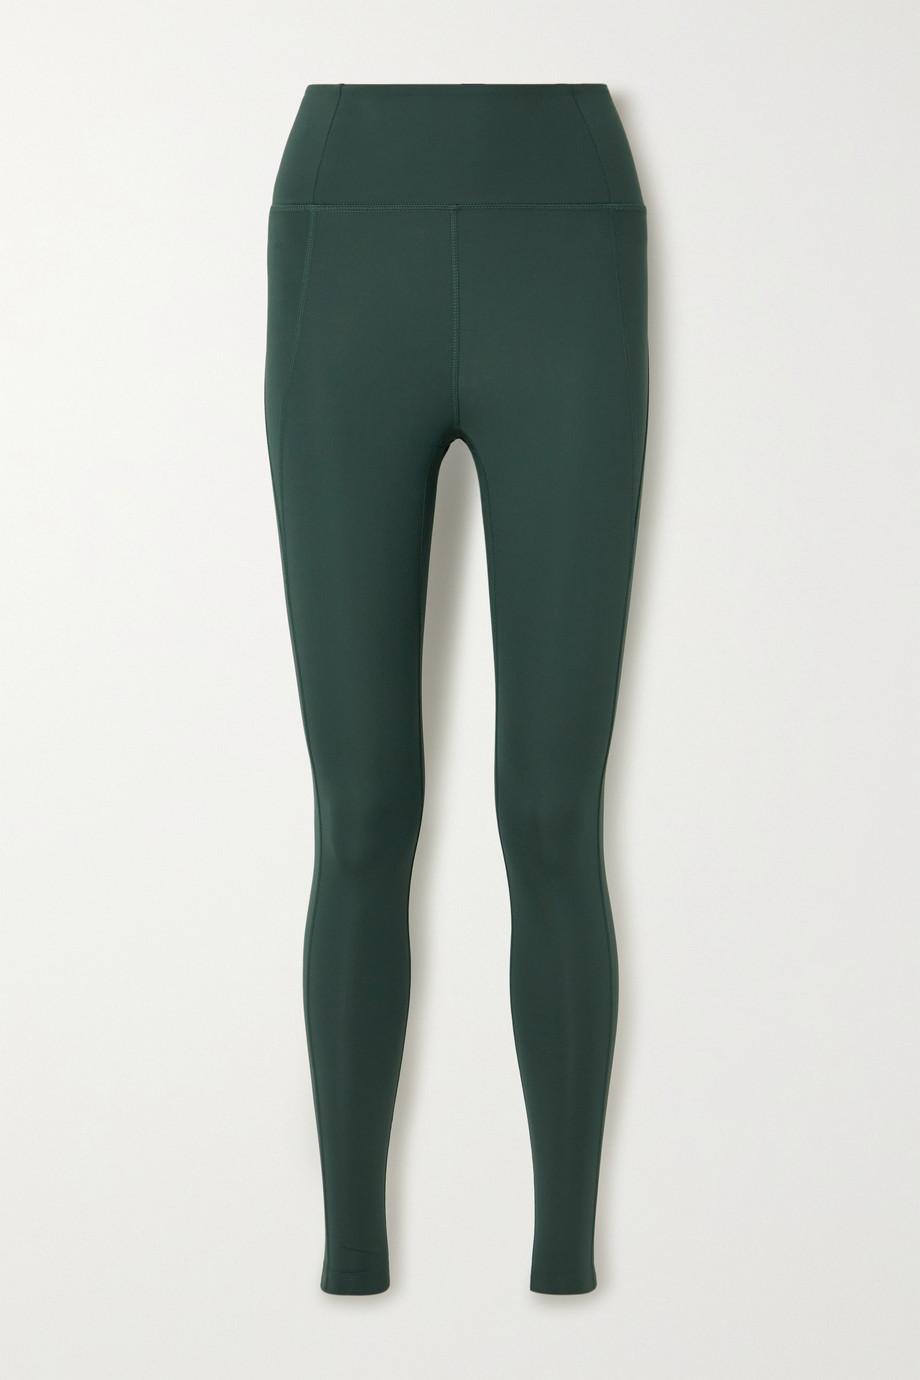 Girlfriend Collective Legging en tissu stretch recyclé Compressive